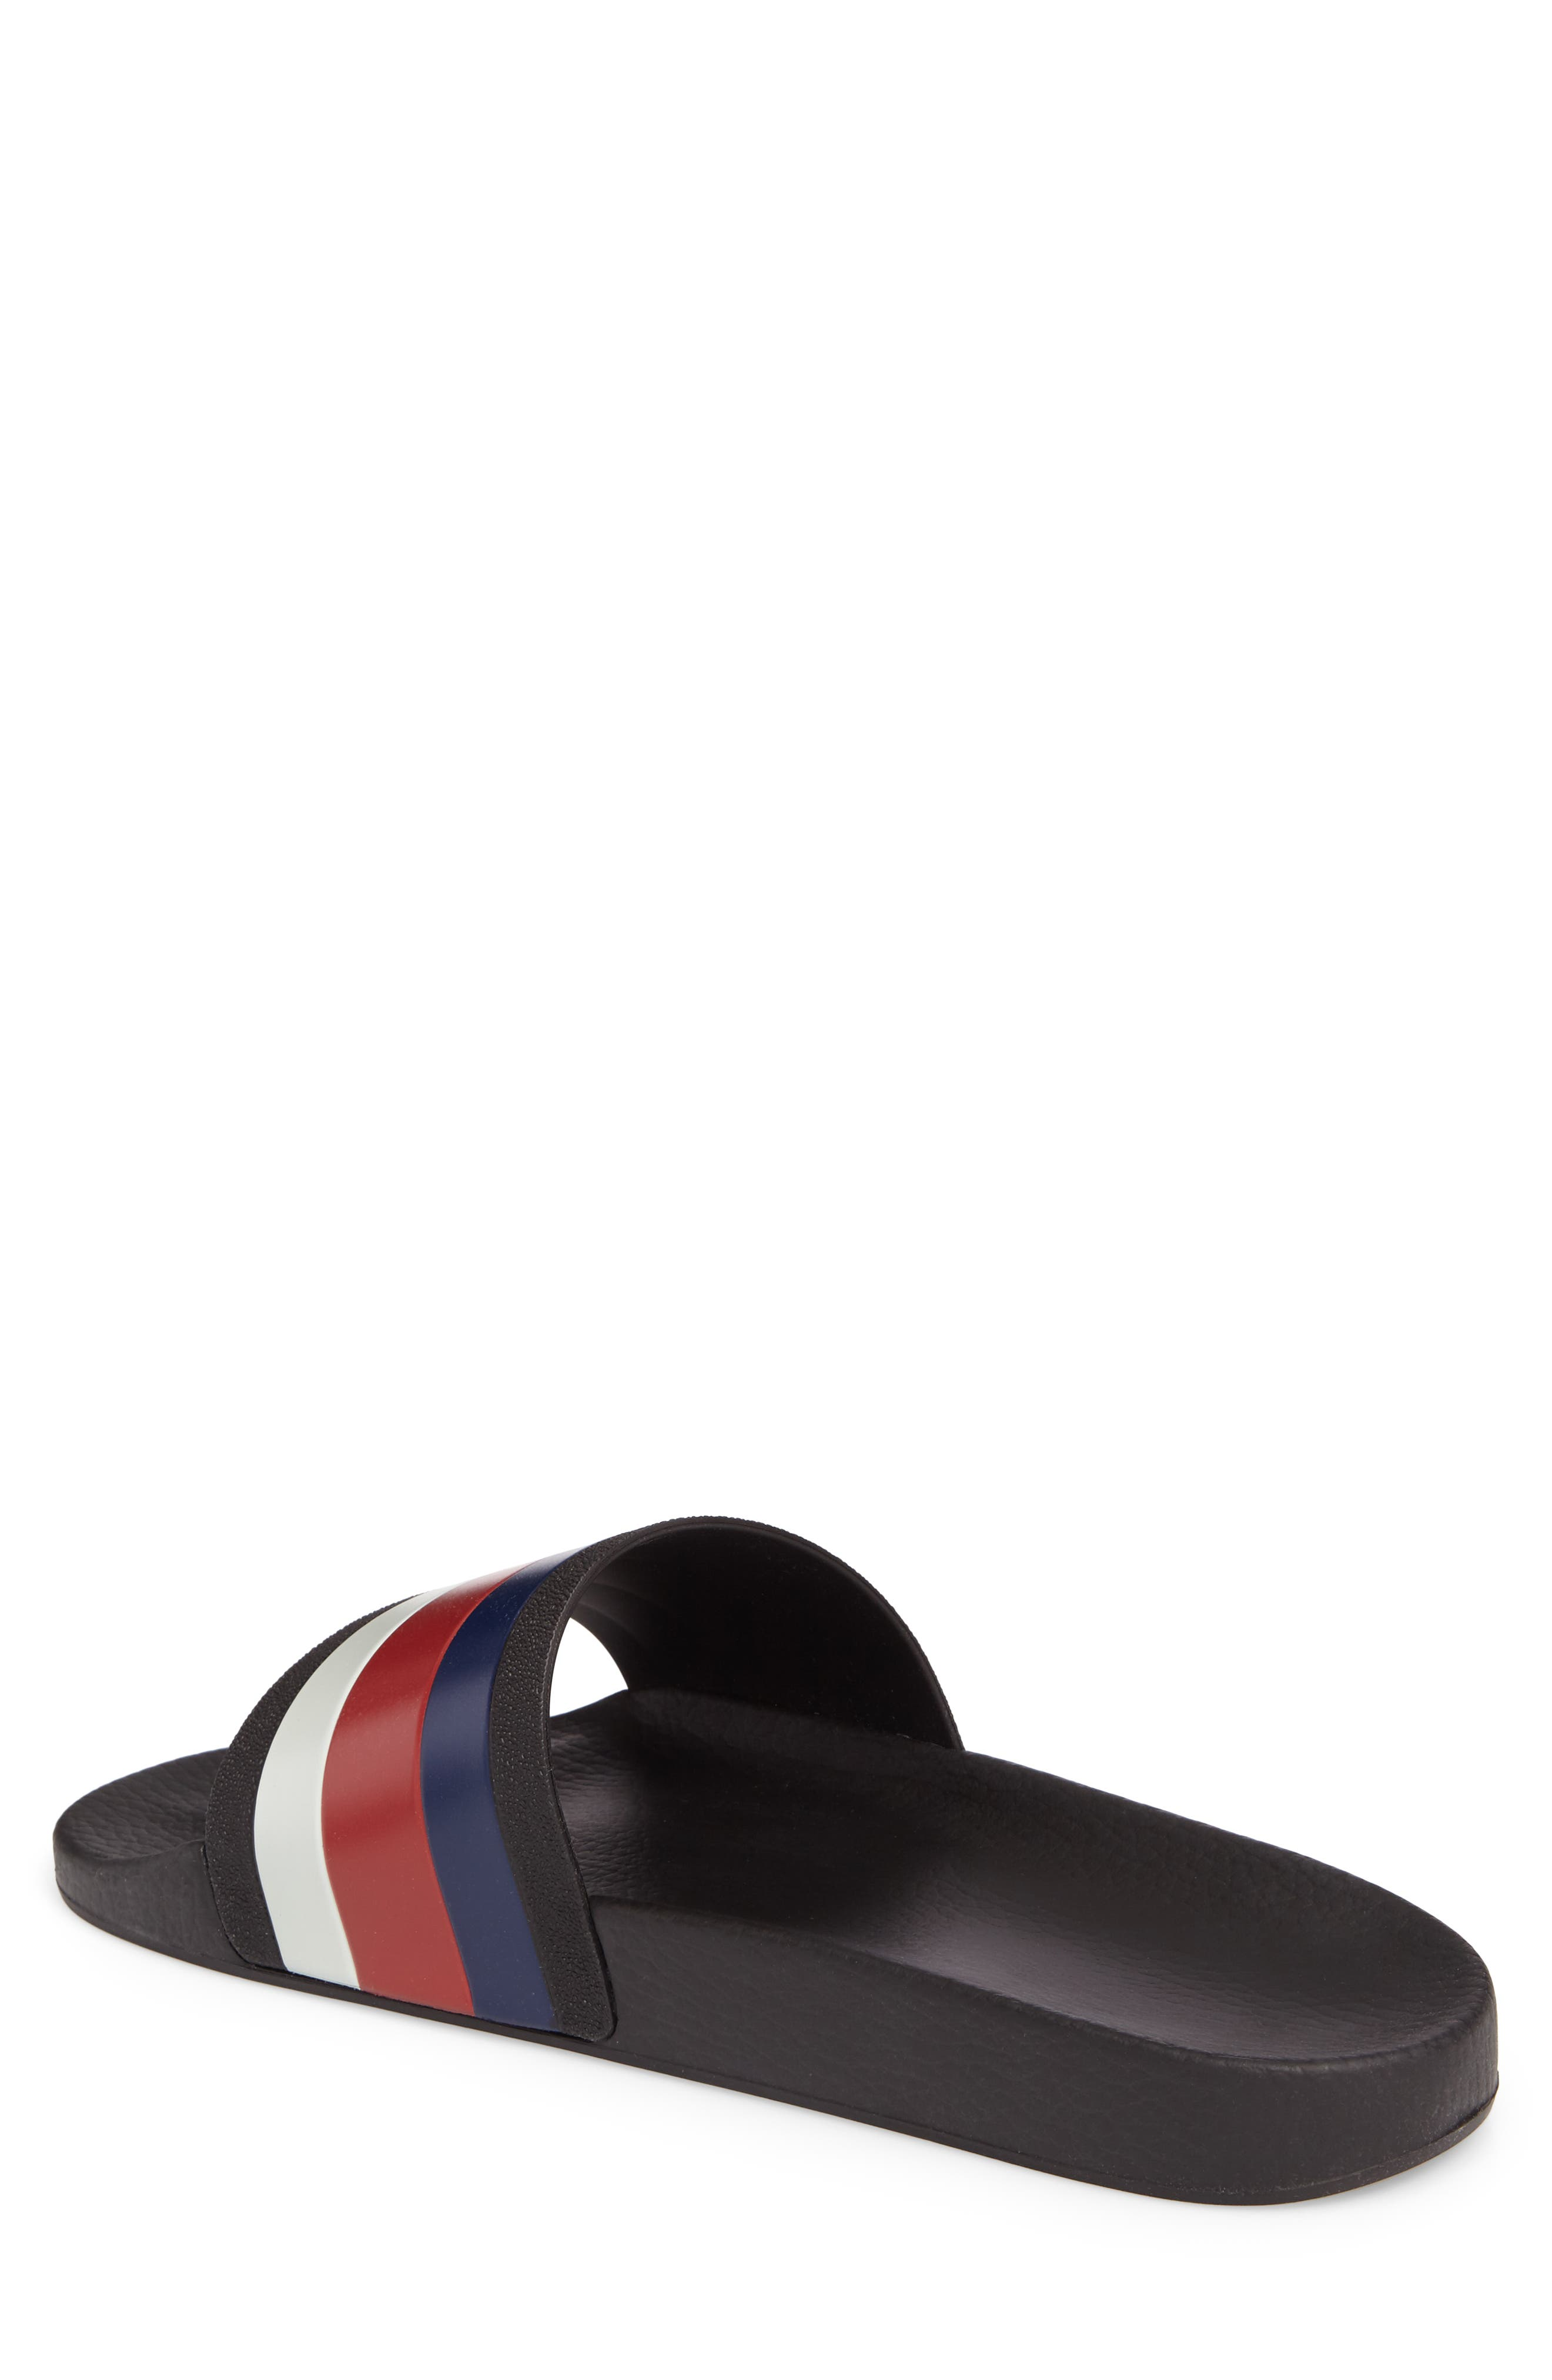 5a95a72d9be9 Gucci Men s Shoes   Accessories